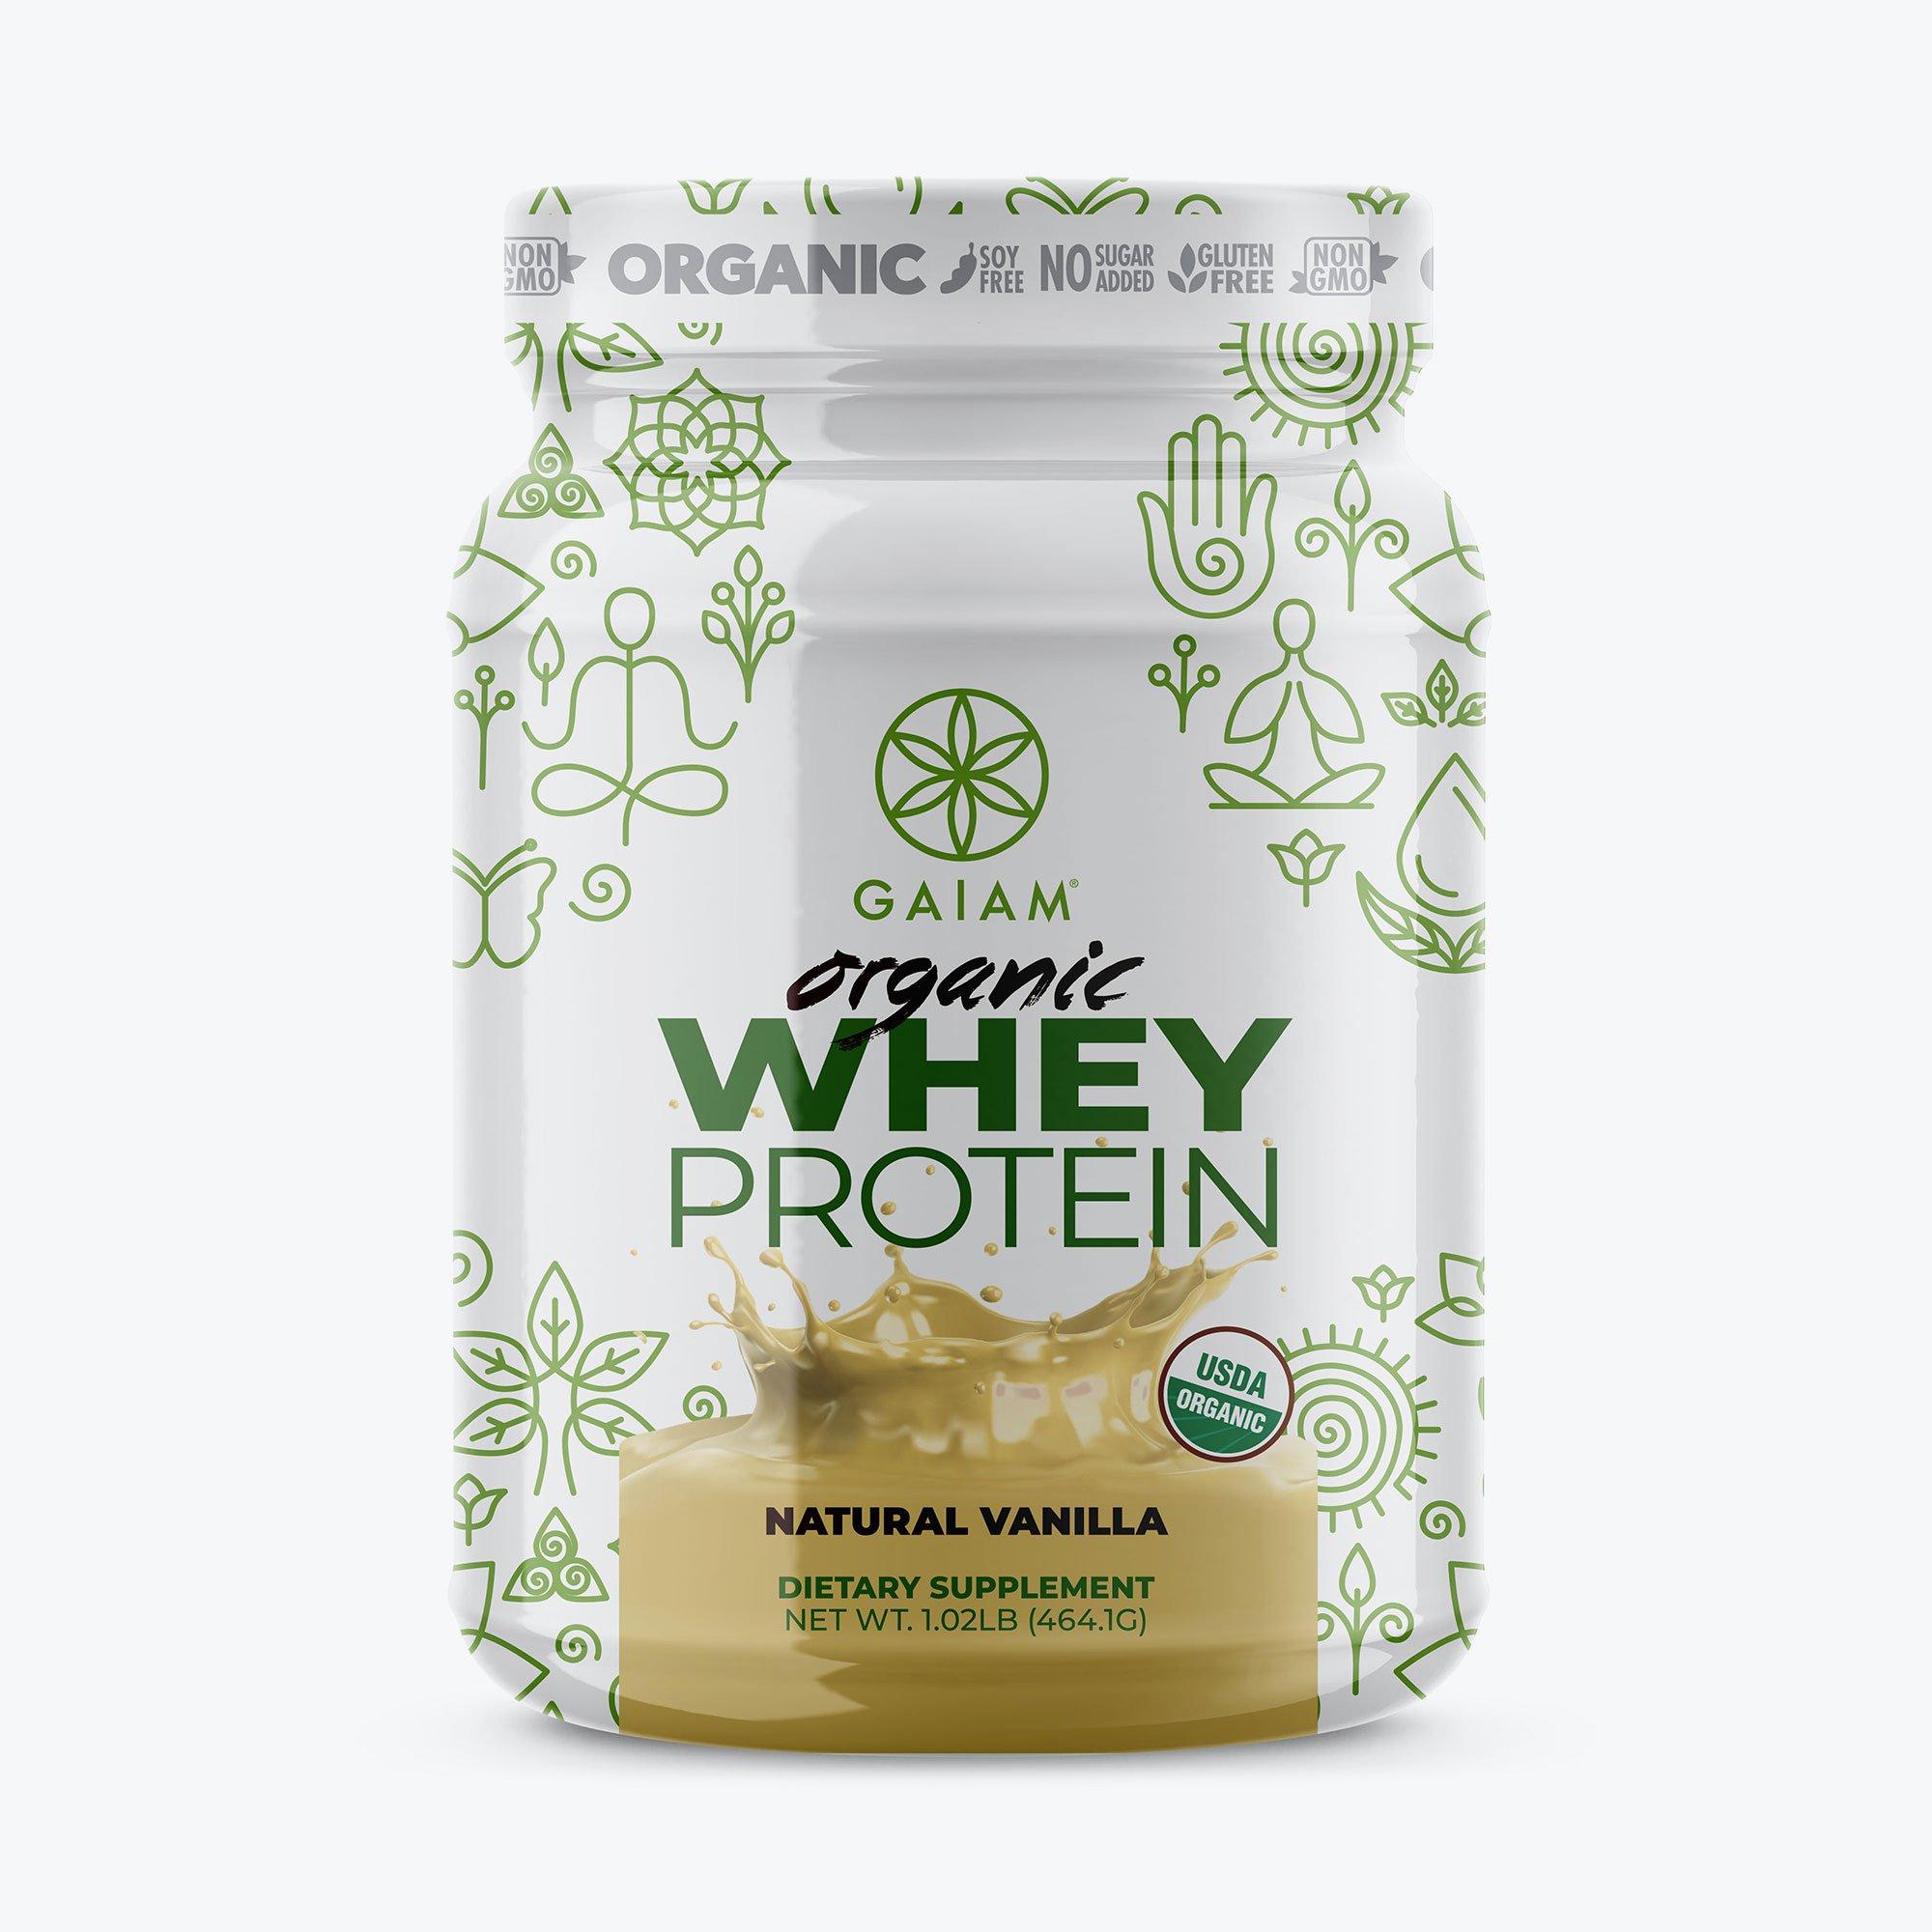 Image of Whey Protein Vanilla